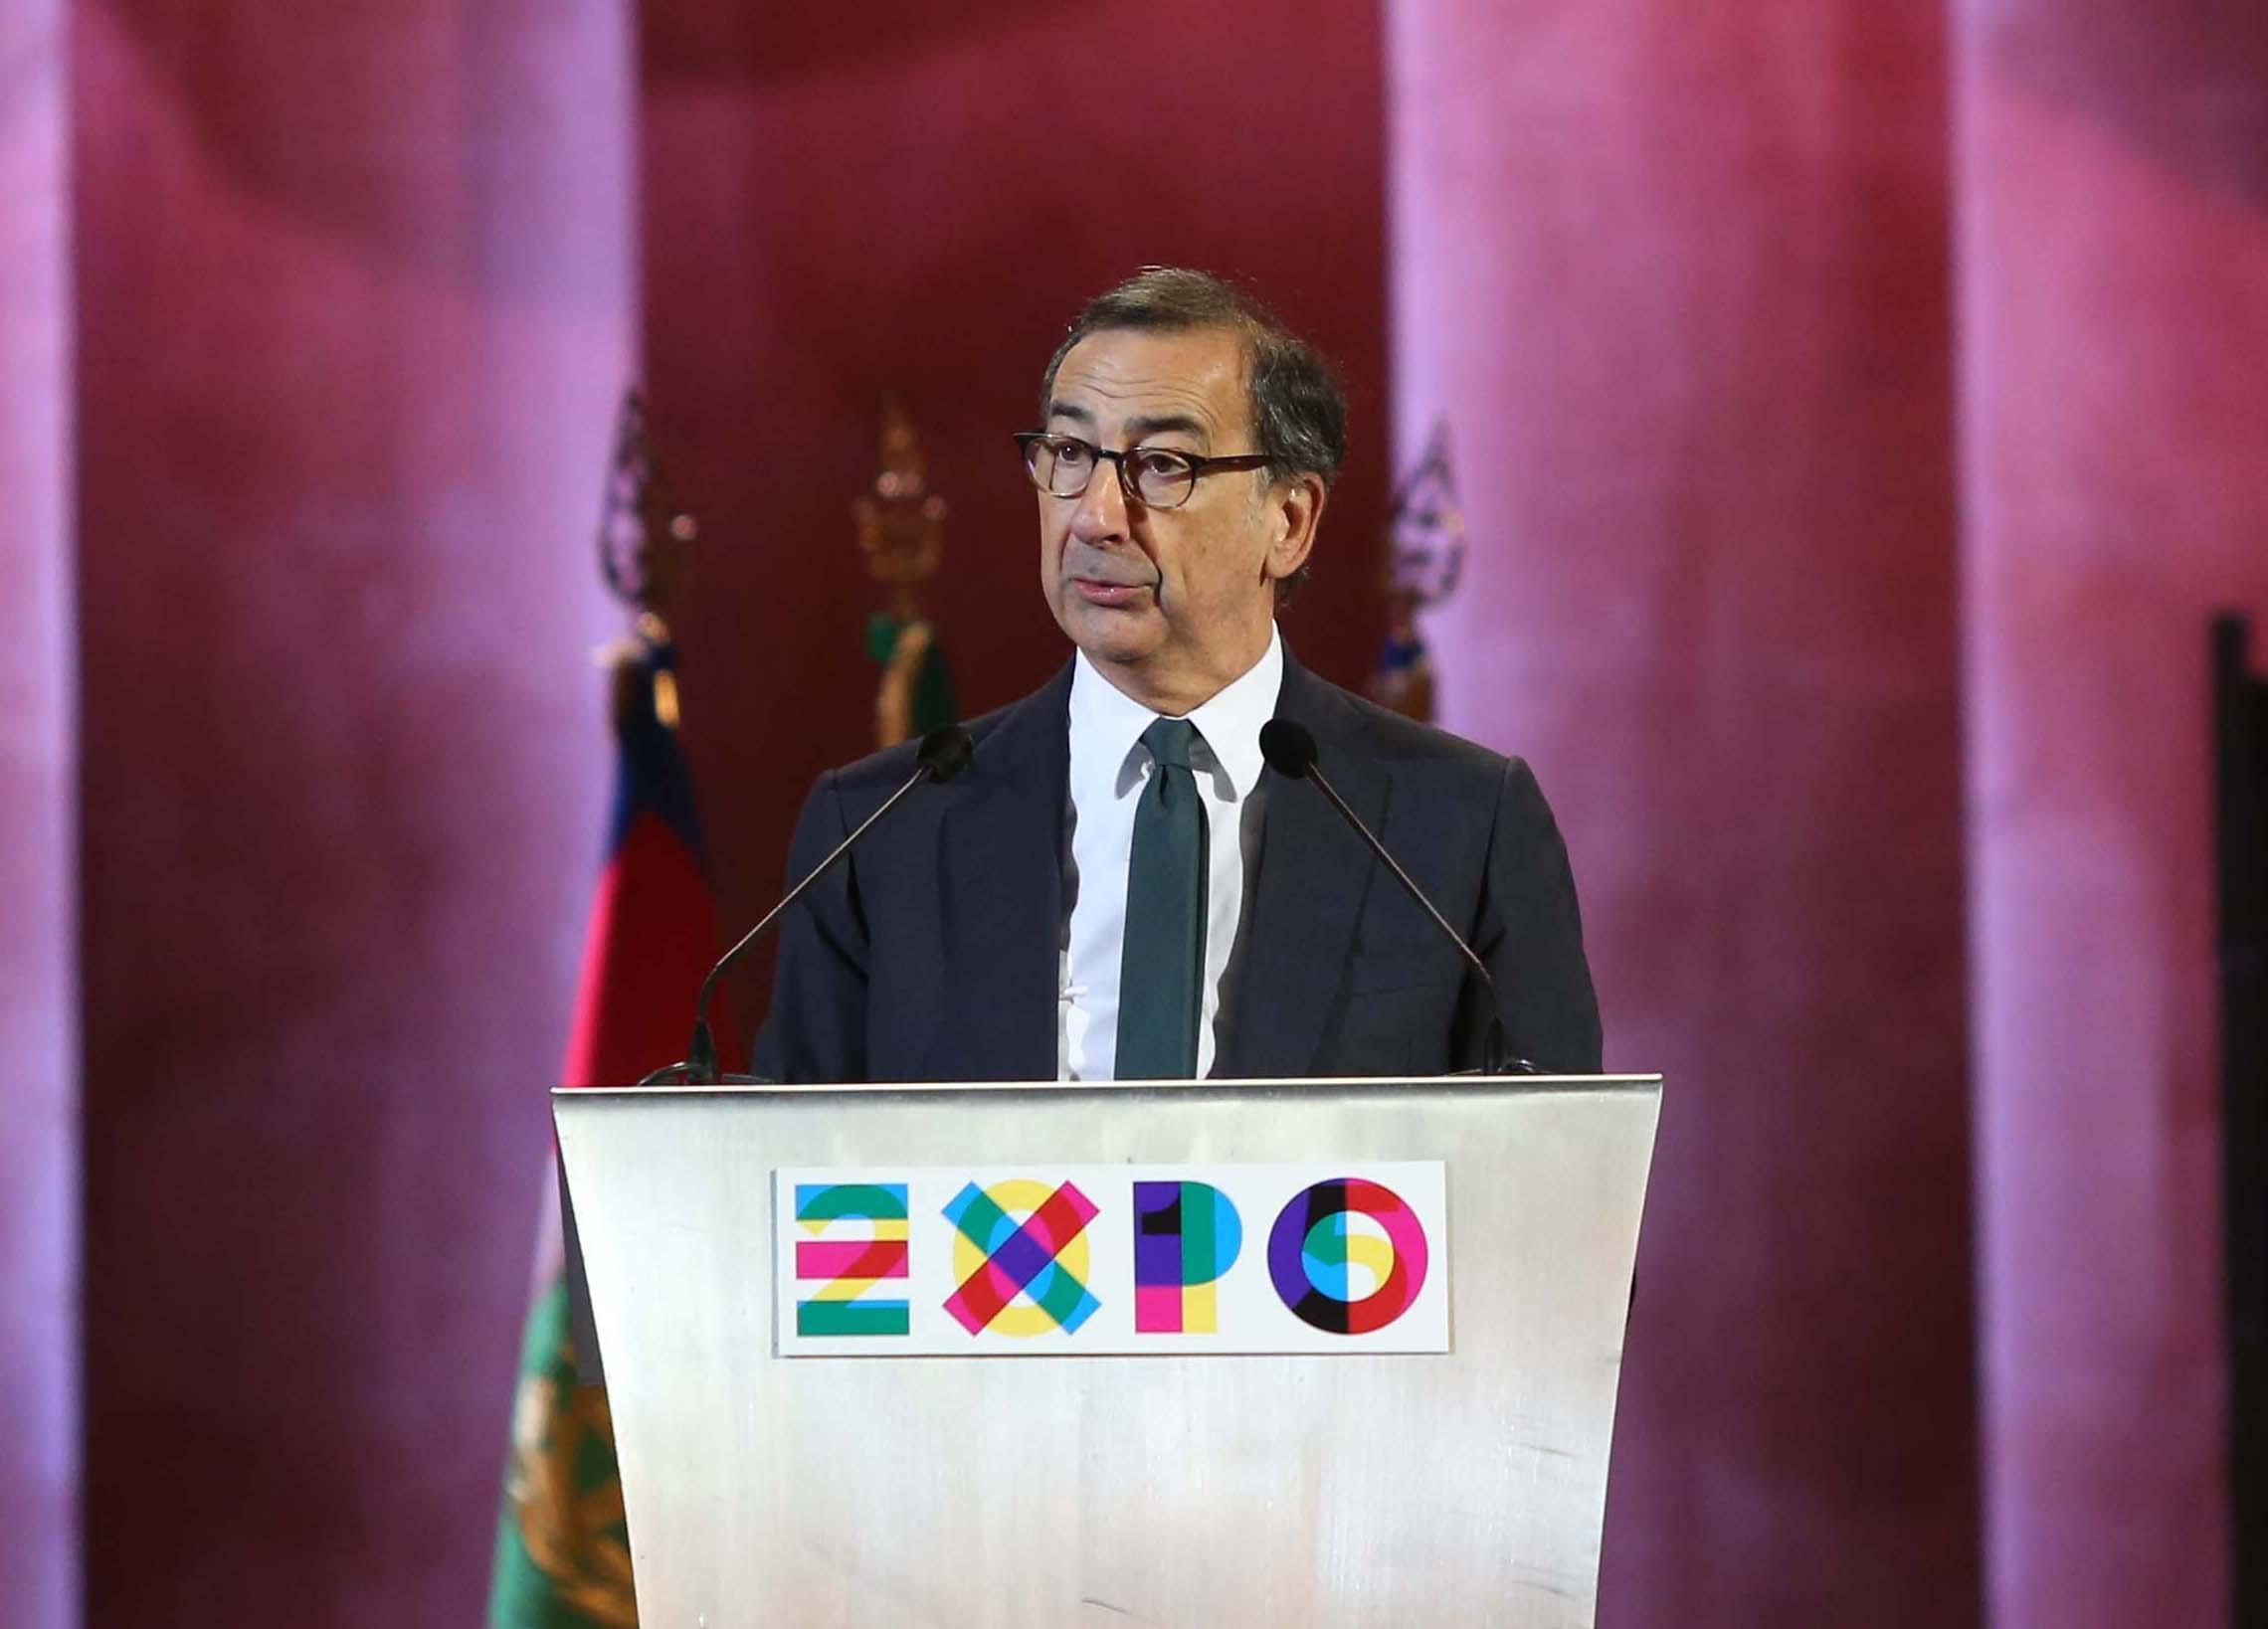 Expo, nuova accusa per sindaco Sala